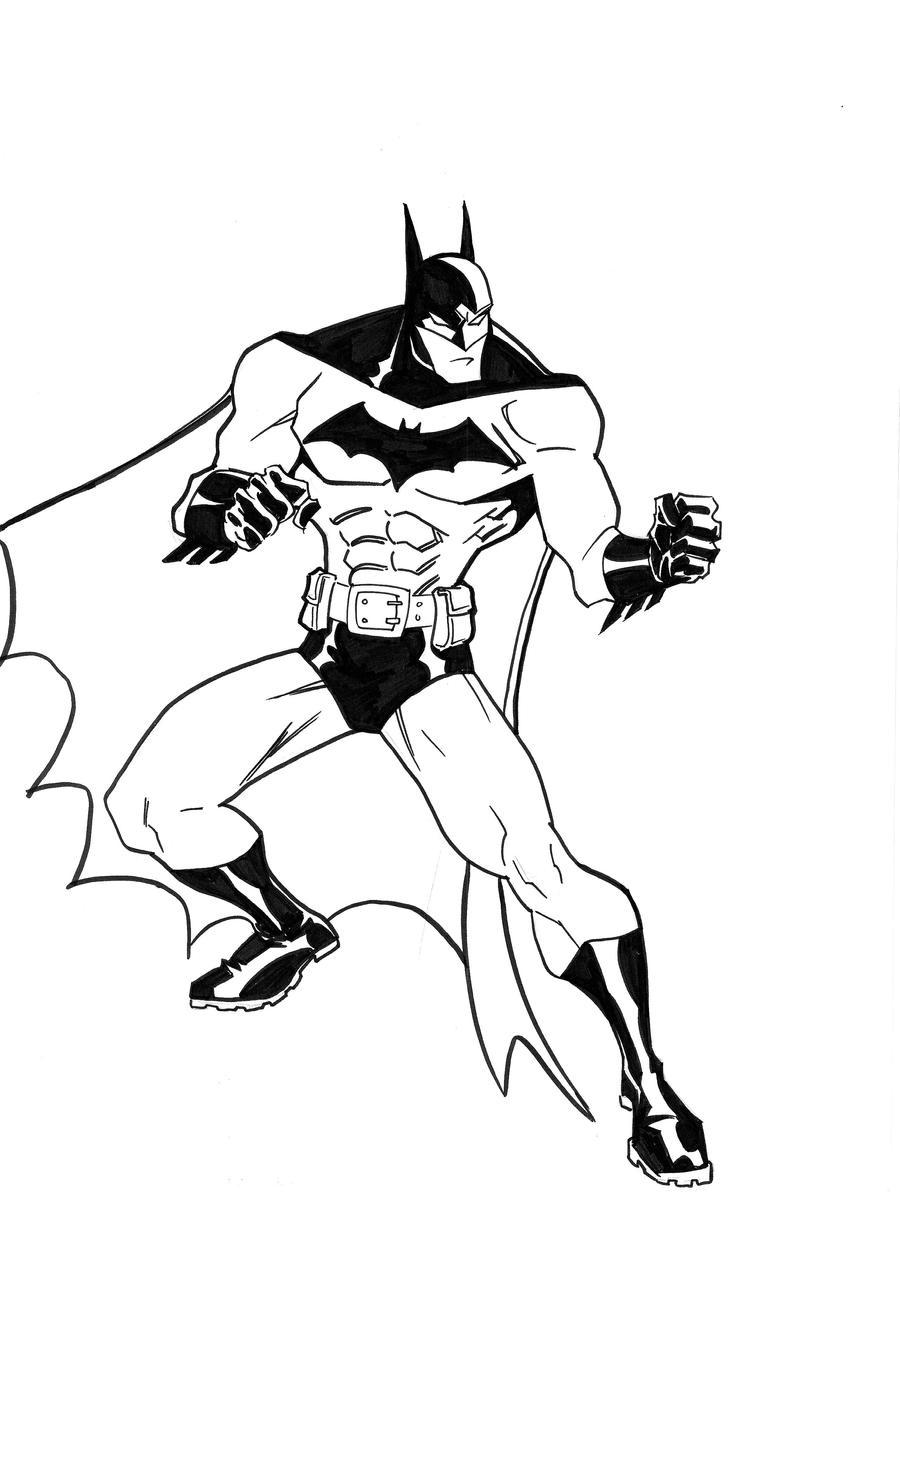 The Batman Inked by scarab109 on DeviantArt